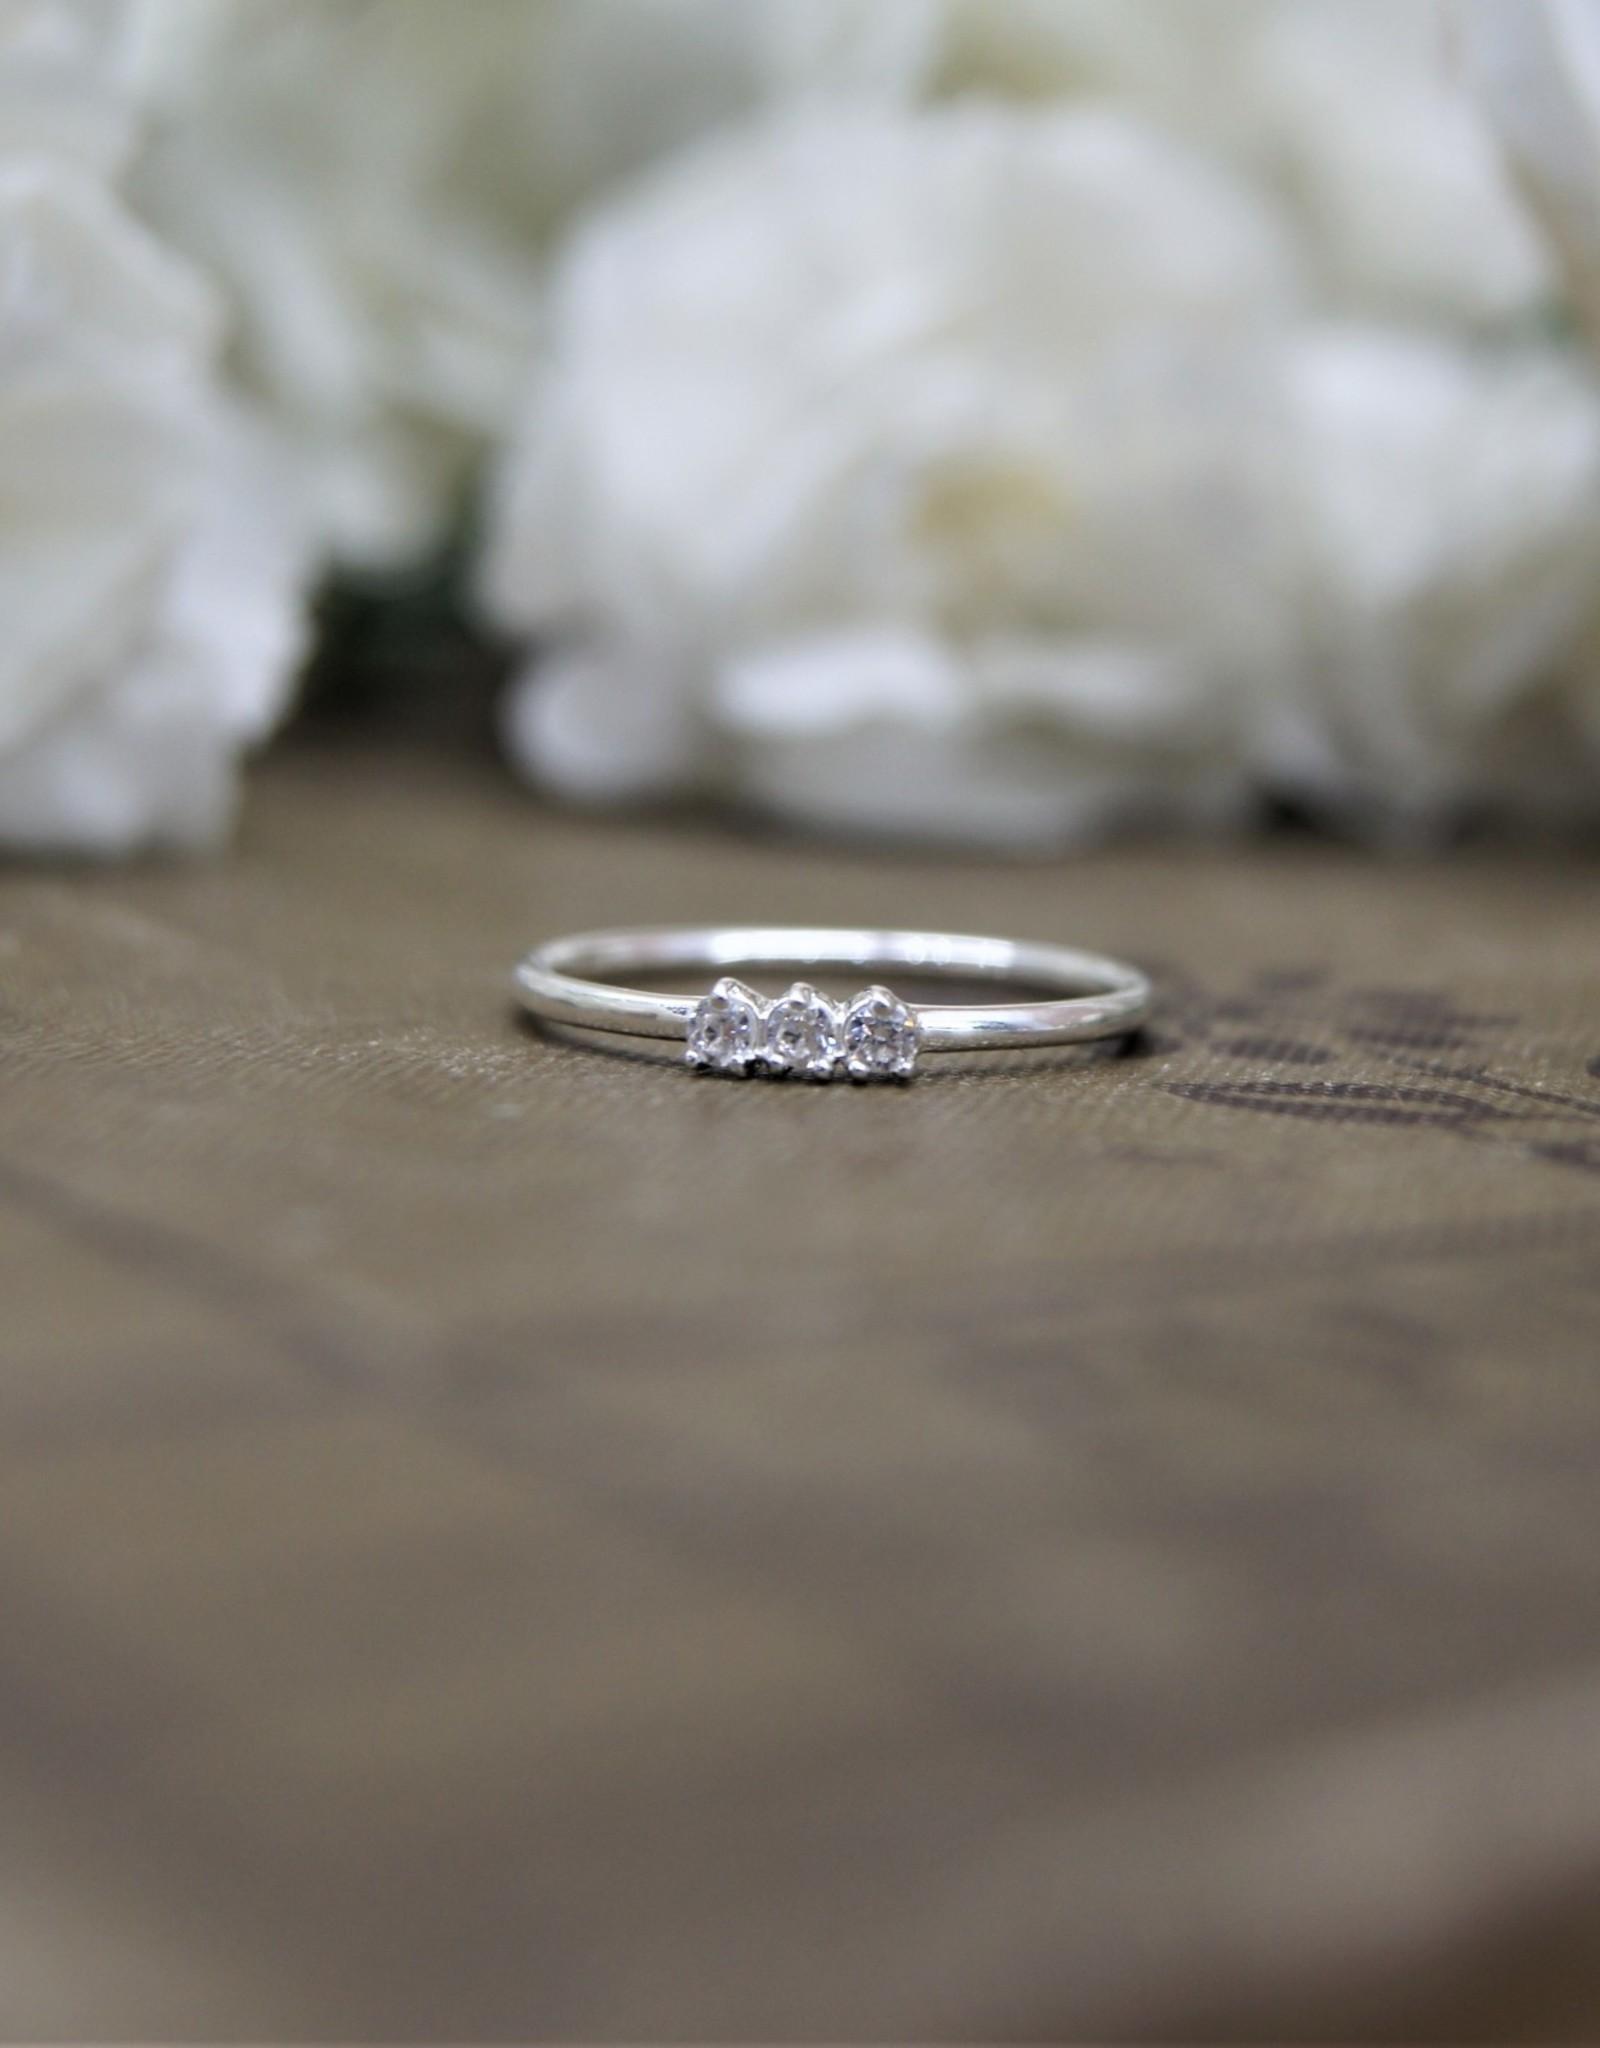 3 Tiny Cubic Zirconia Band Ring